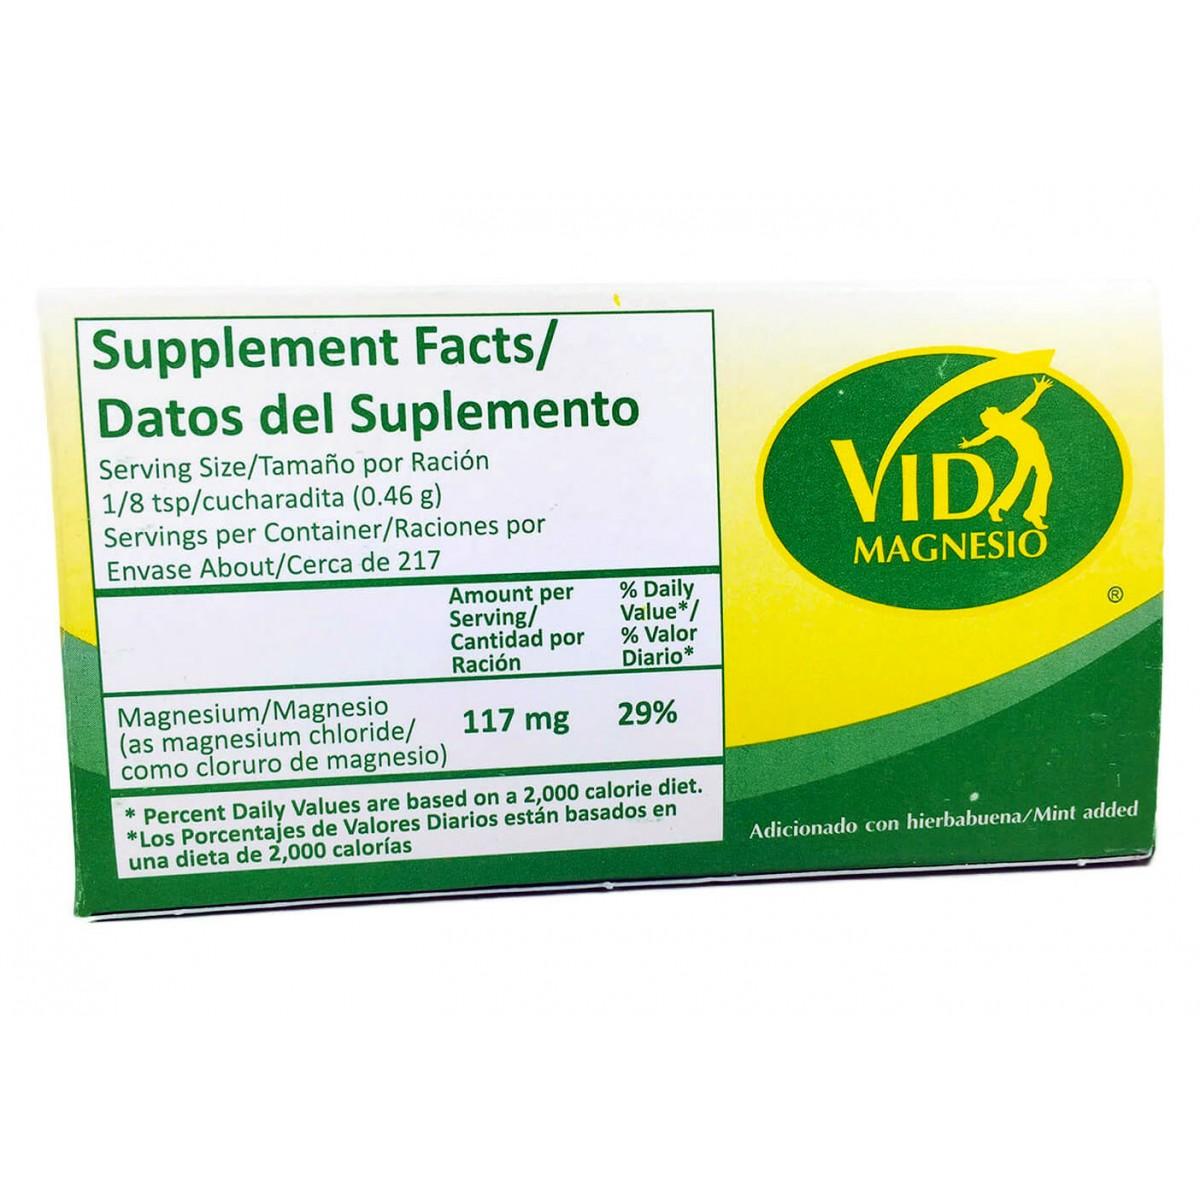 Cloruro de Magnesio en USA 100% Puro solo $6.89 o menos